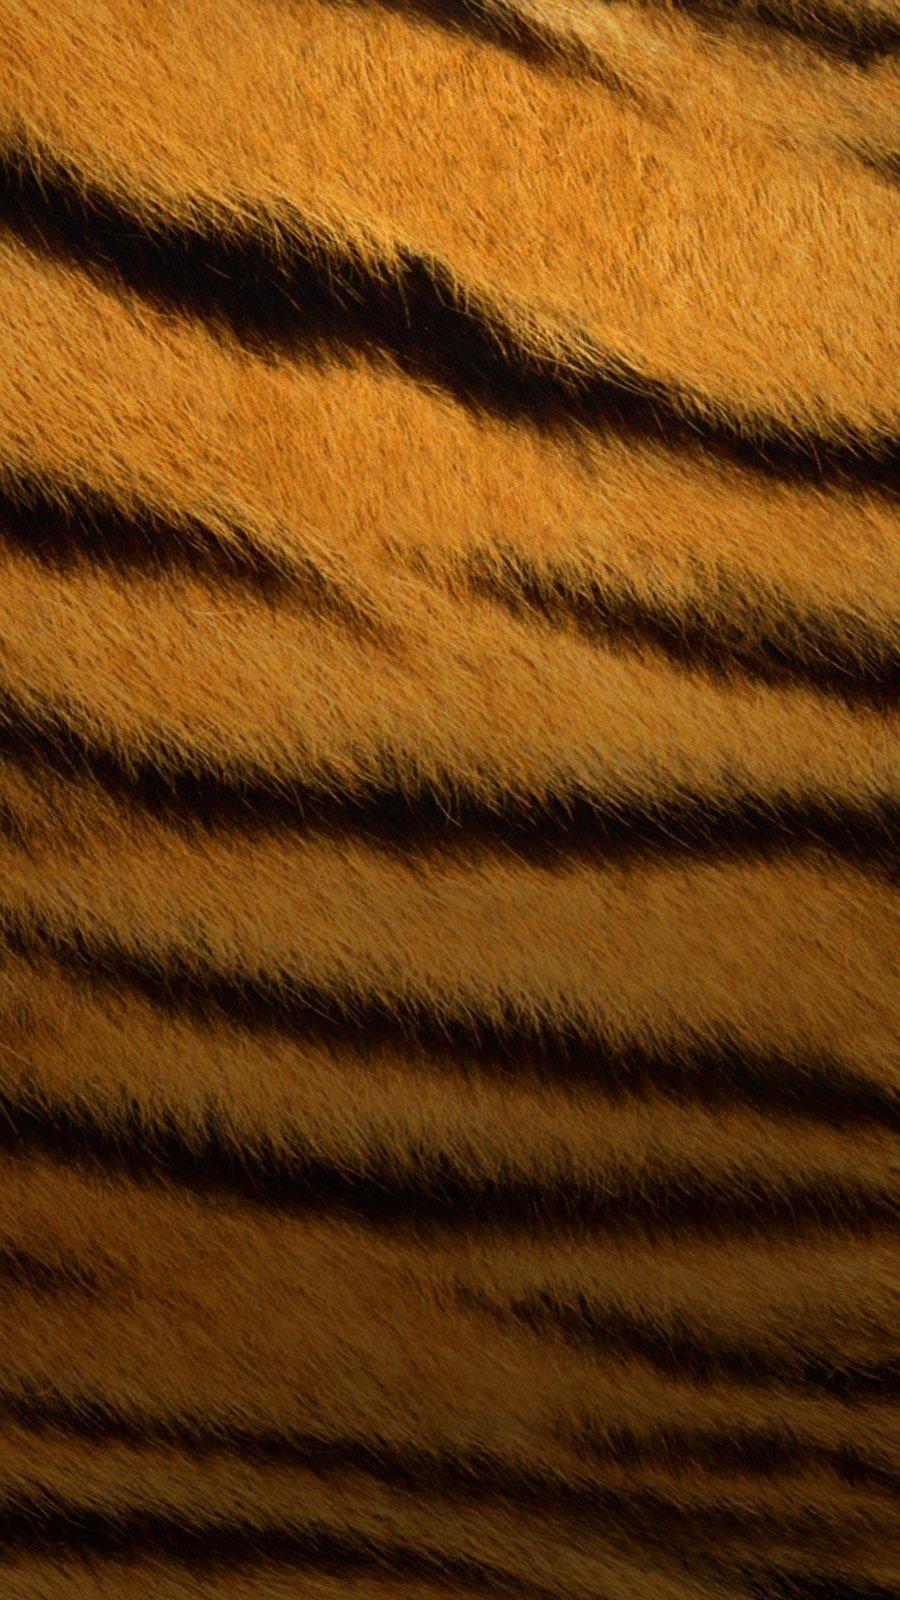 Fondos de pantalla Textura Piel de Tigre Vertical